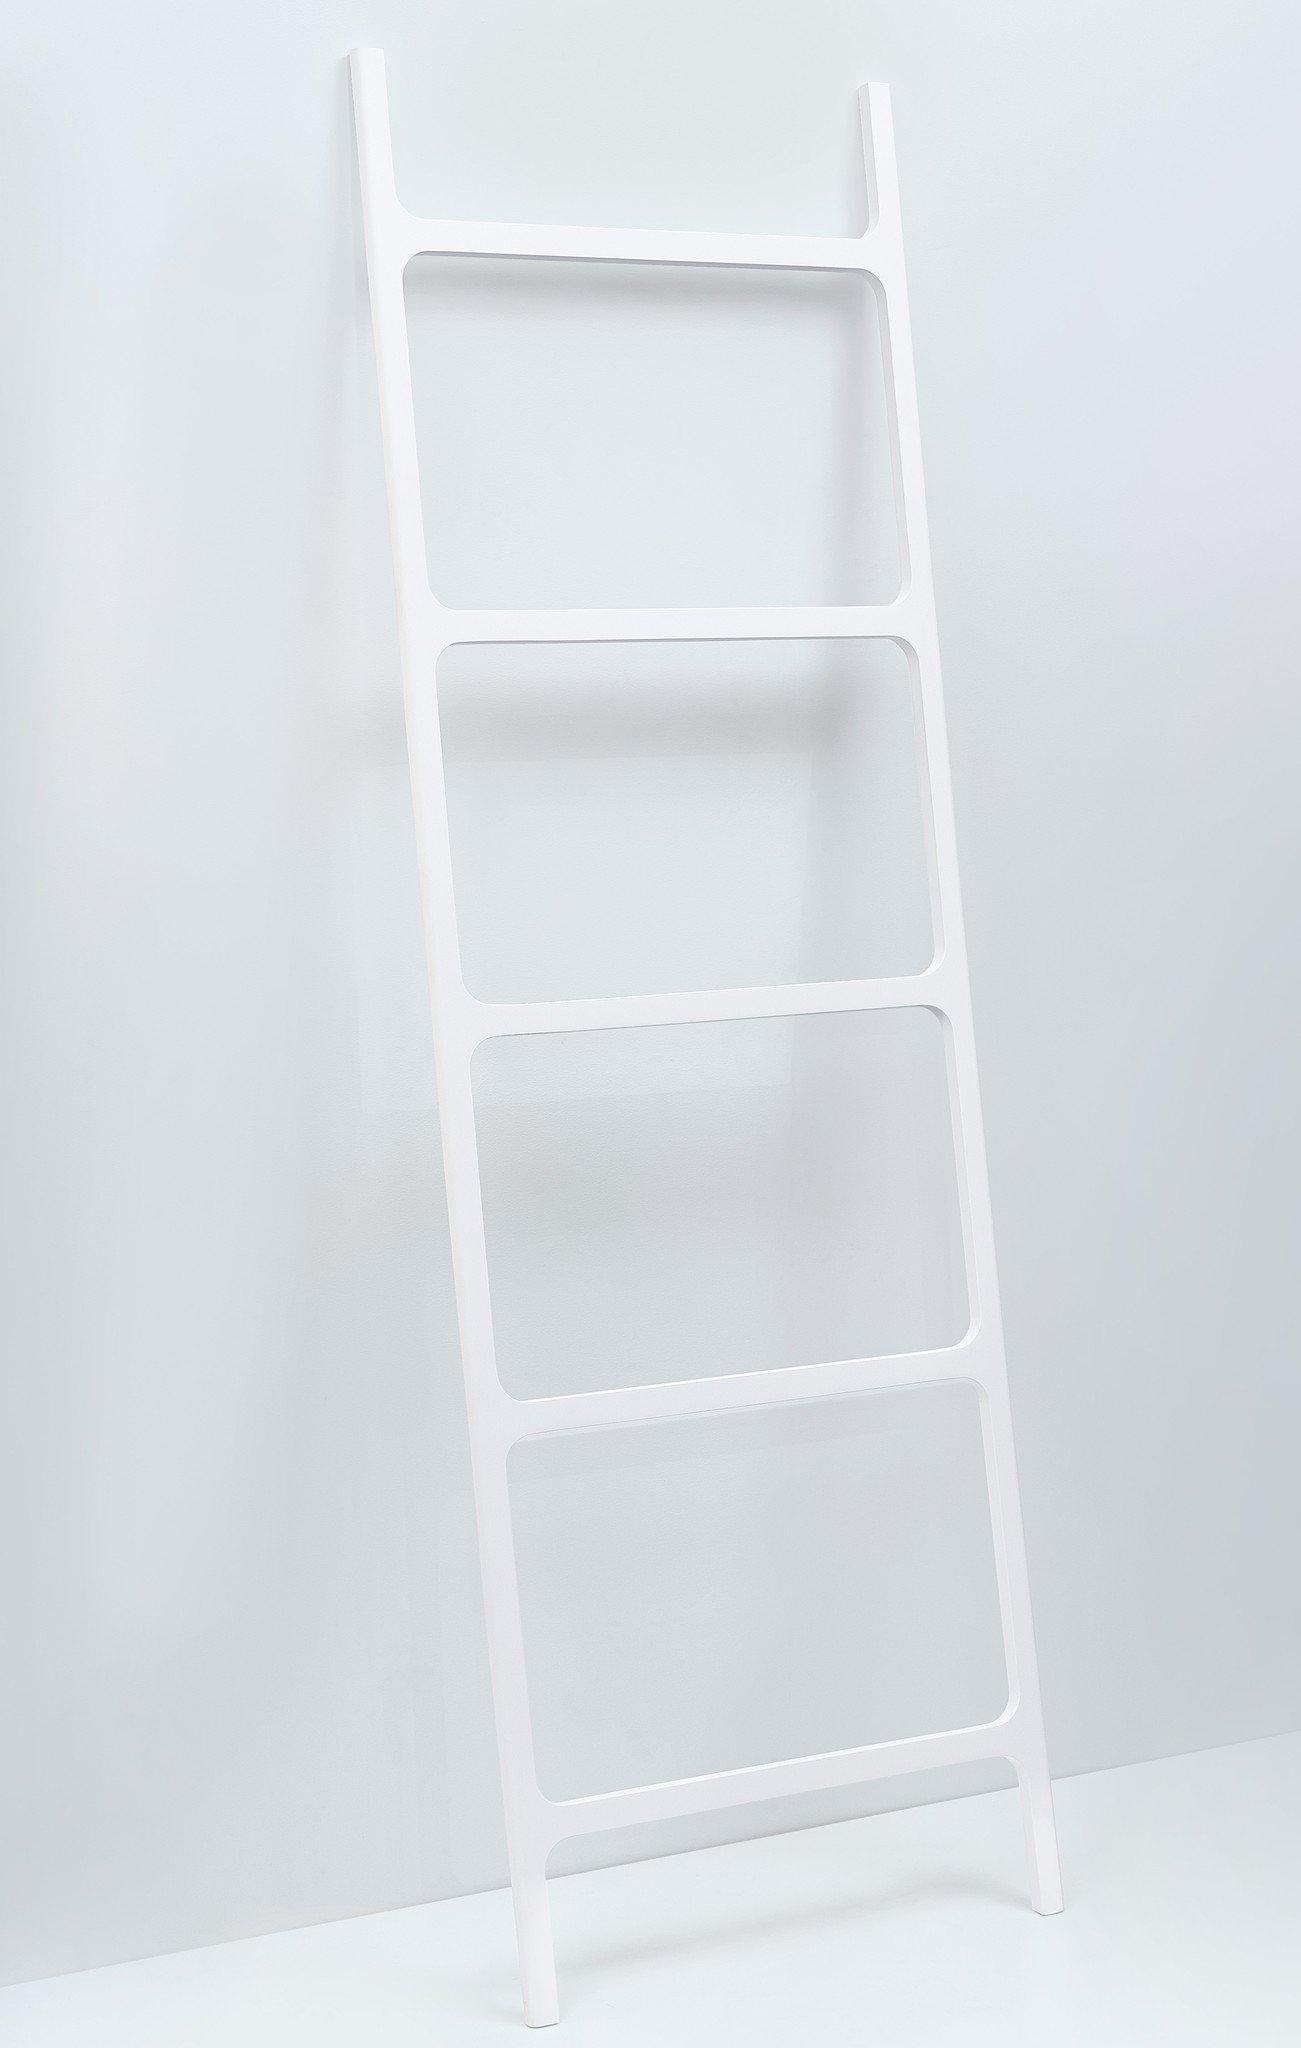 DWBA Stone Standing Towel Rack Ladder for Bathroom Spa Towel Hanger, White by DWBA Bath Collection (Image #2)